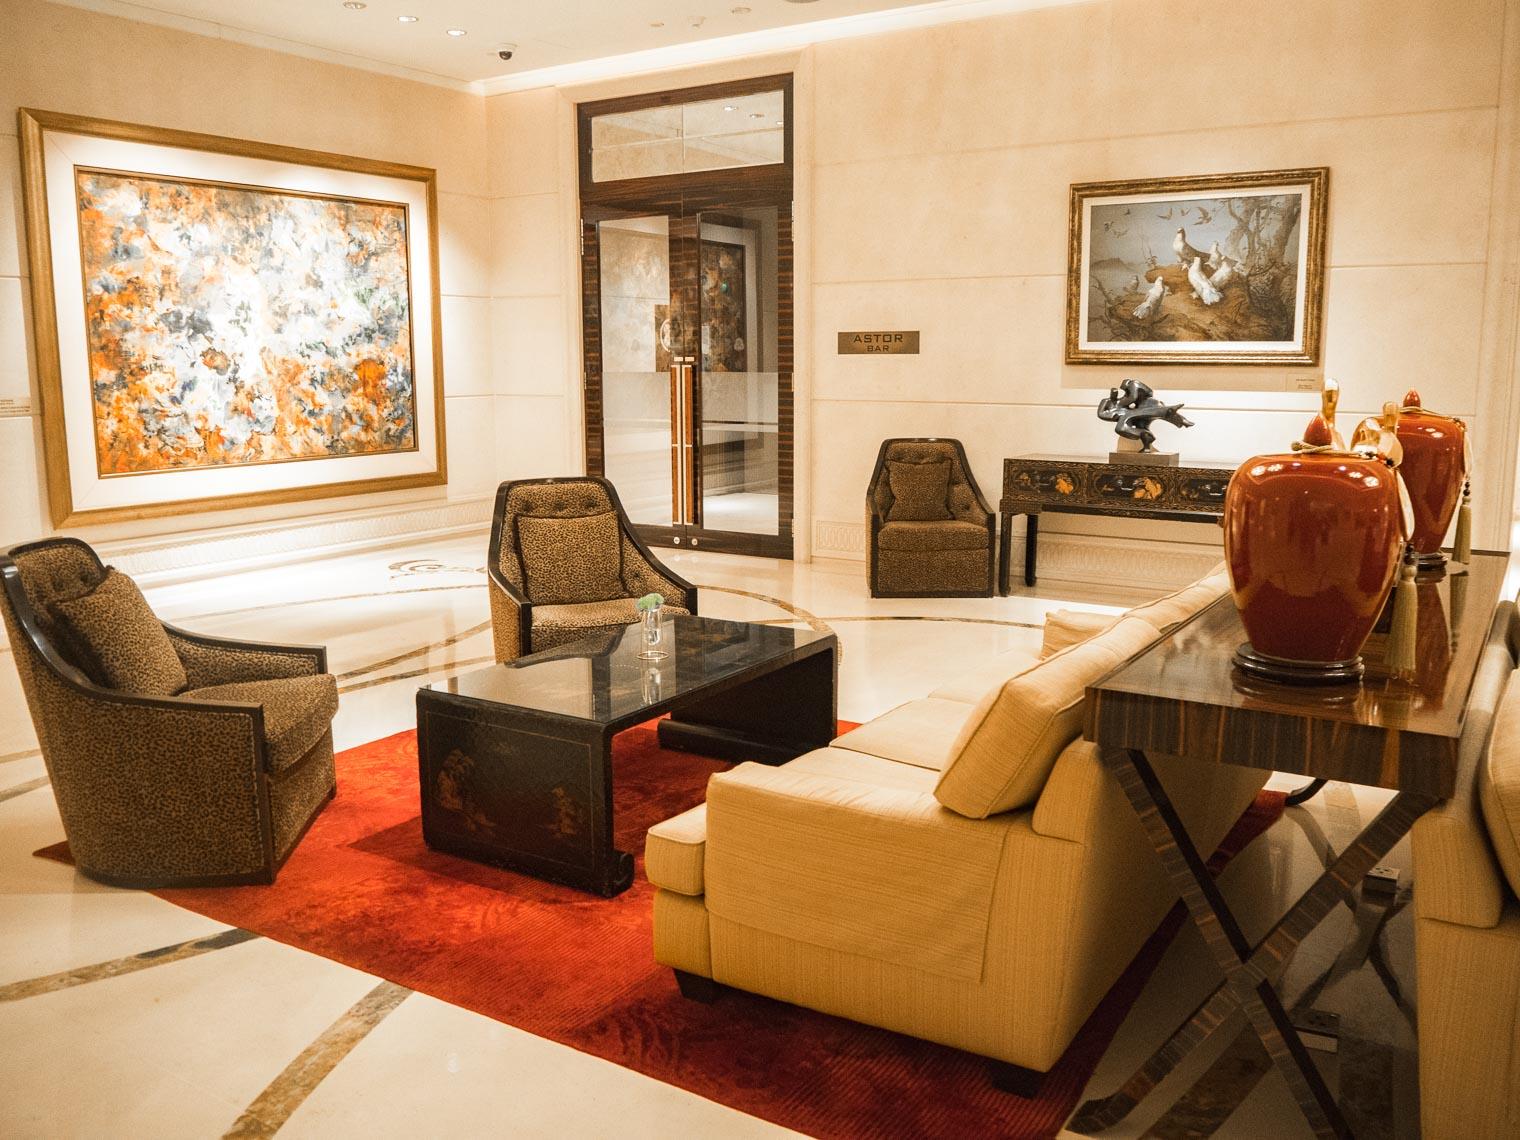 Lobby at St Regis Singapore